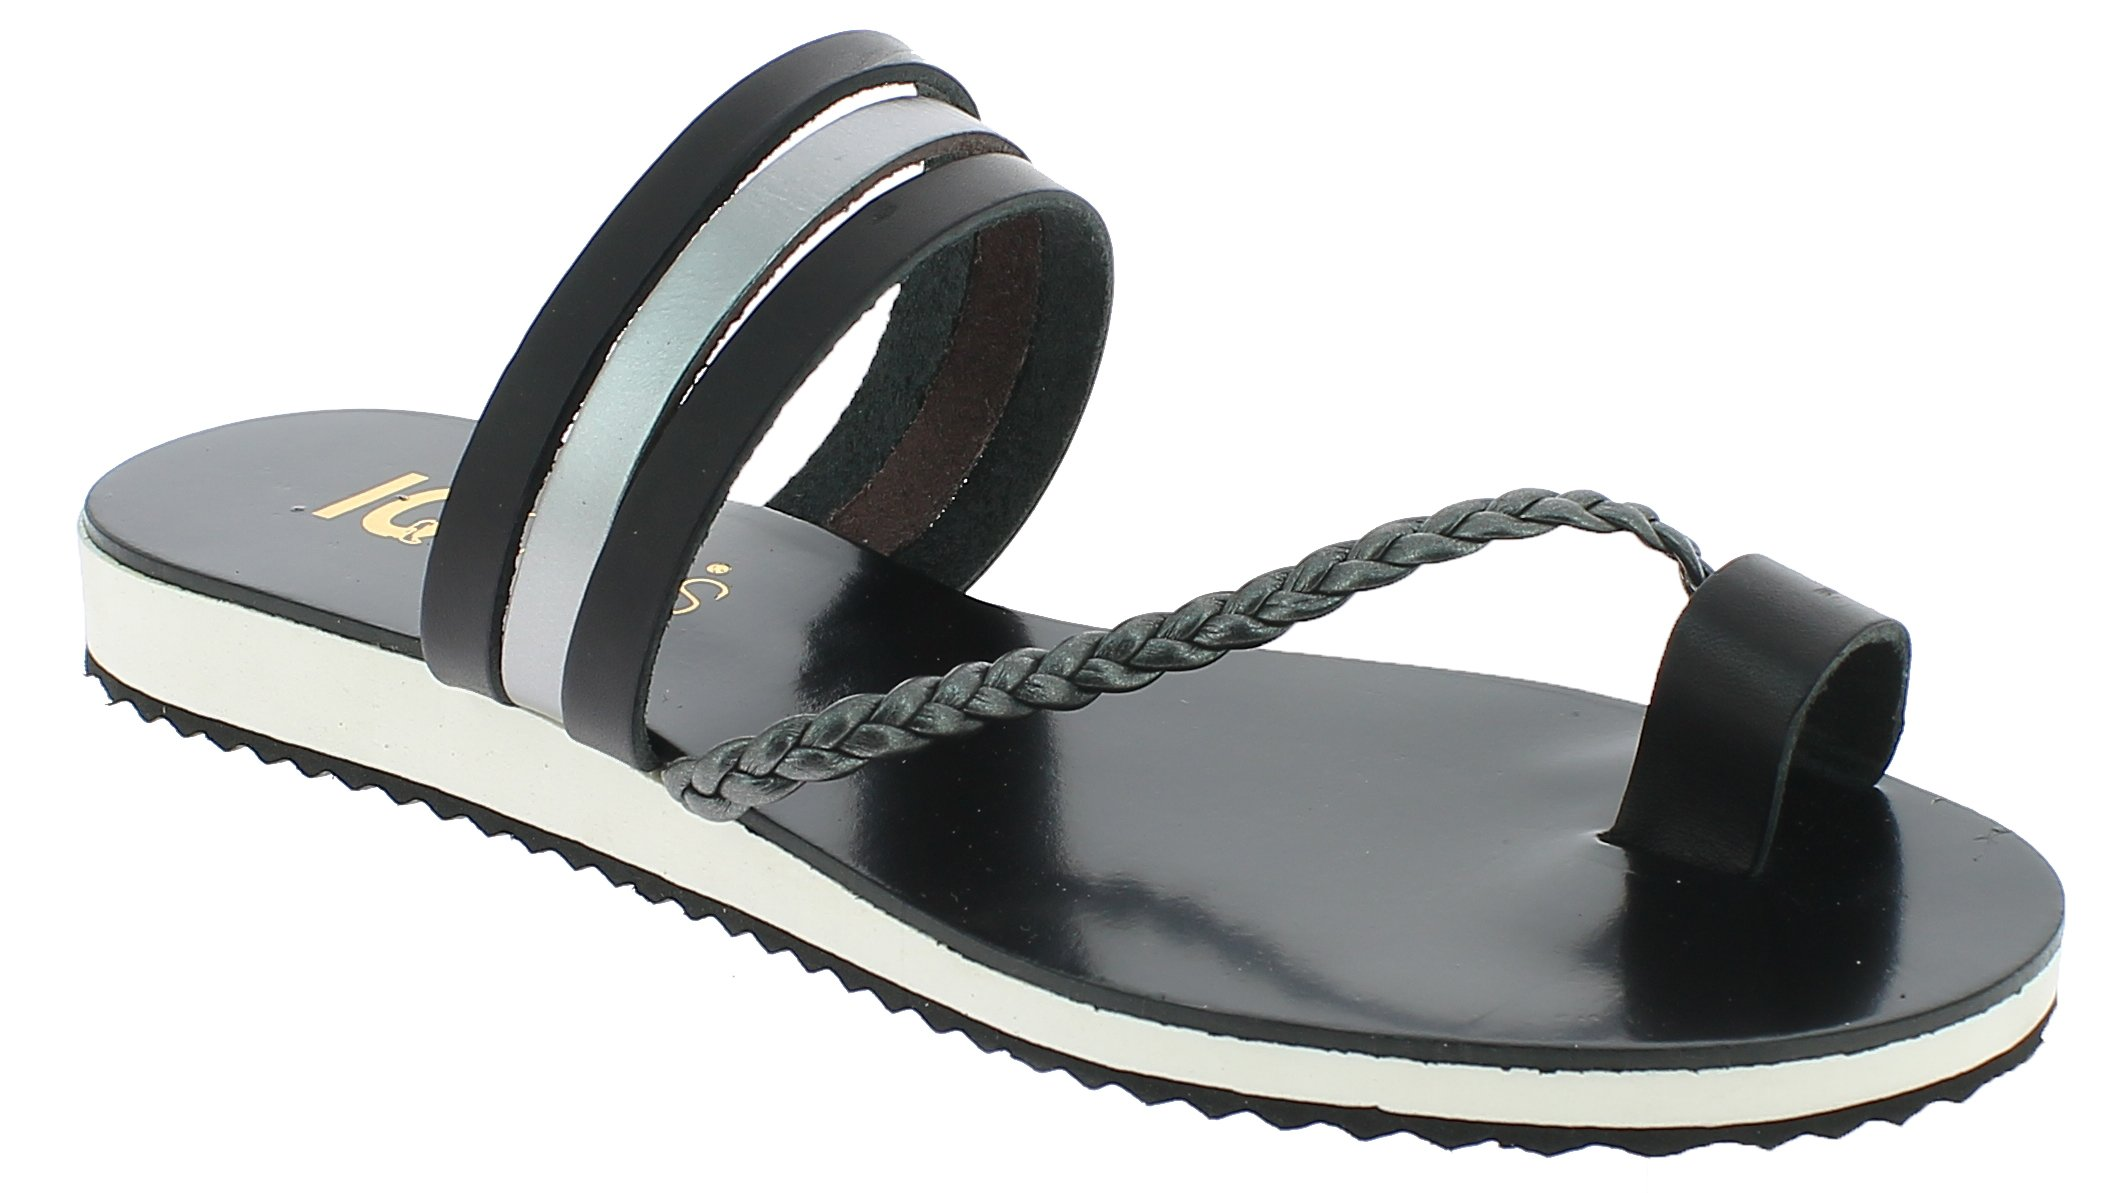 IQSHOES Γυναικείο Σανδάλι 211 Μαύρο - IqShoes - 211 BLACK black 36/1/15/7 παπούτσια  προσφορεσ